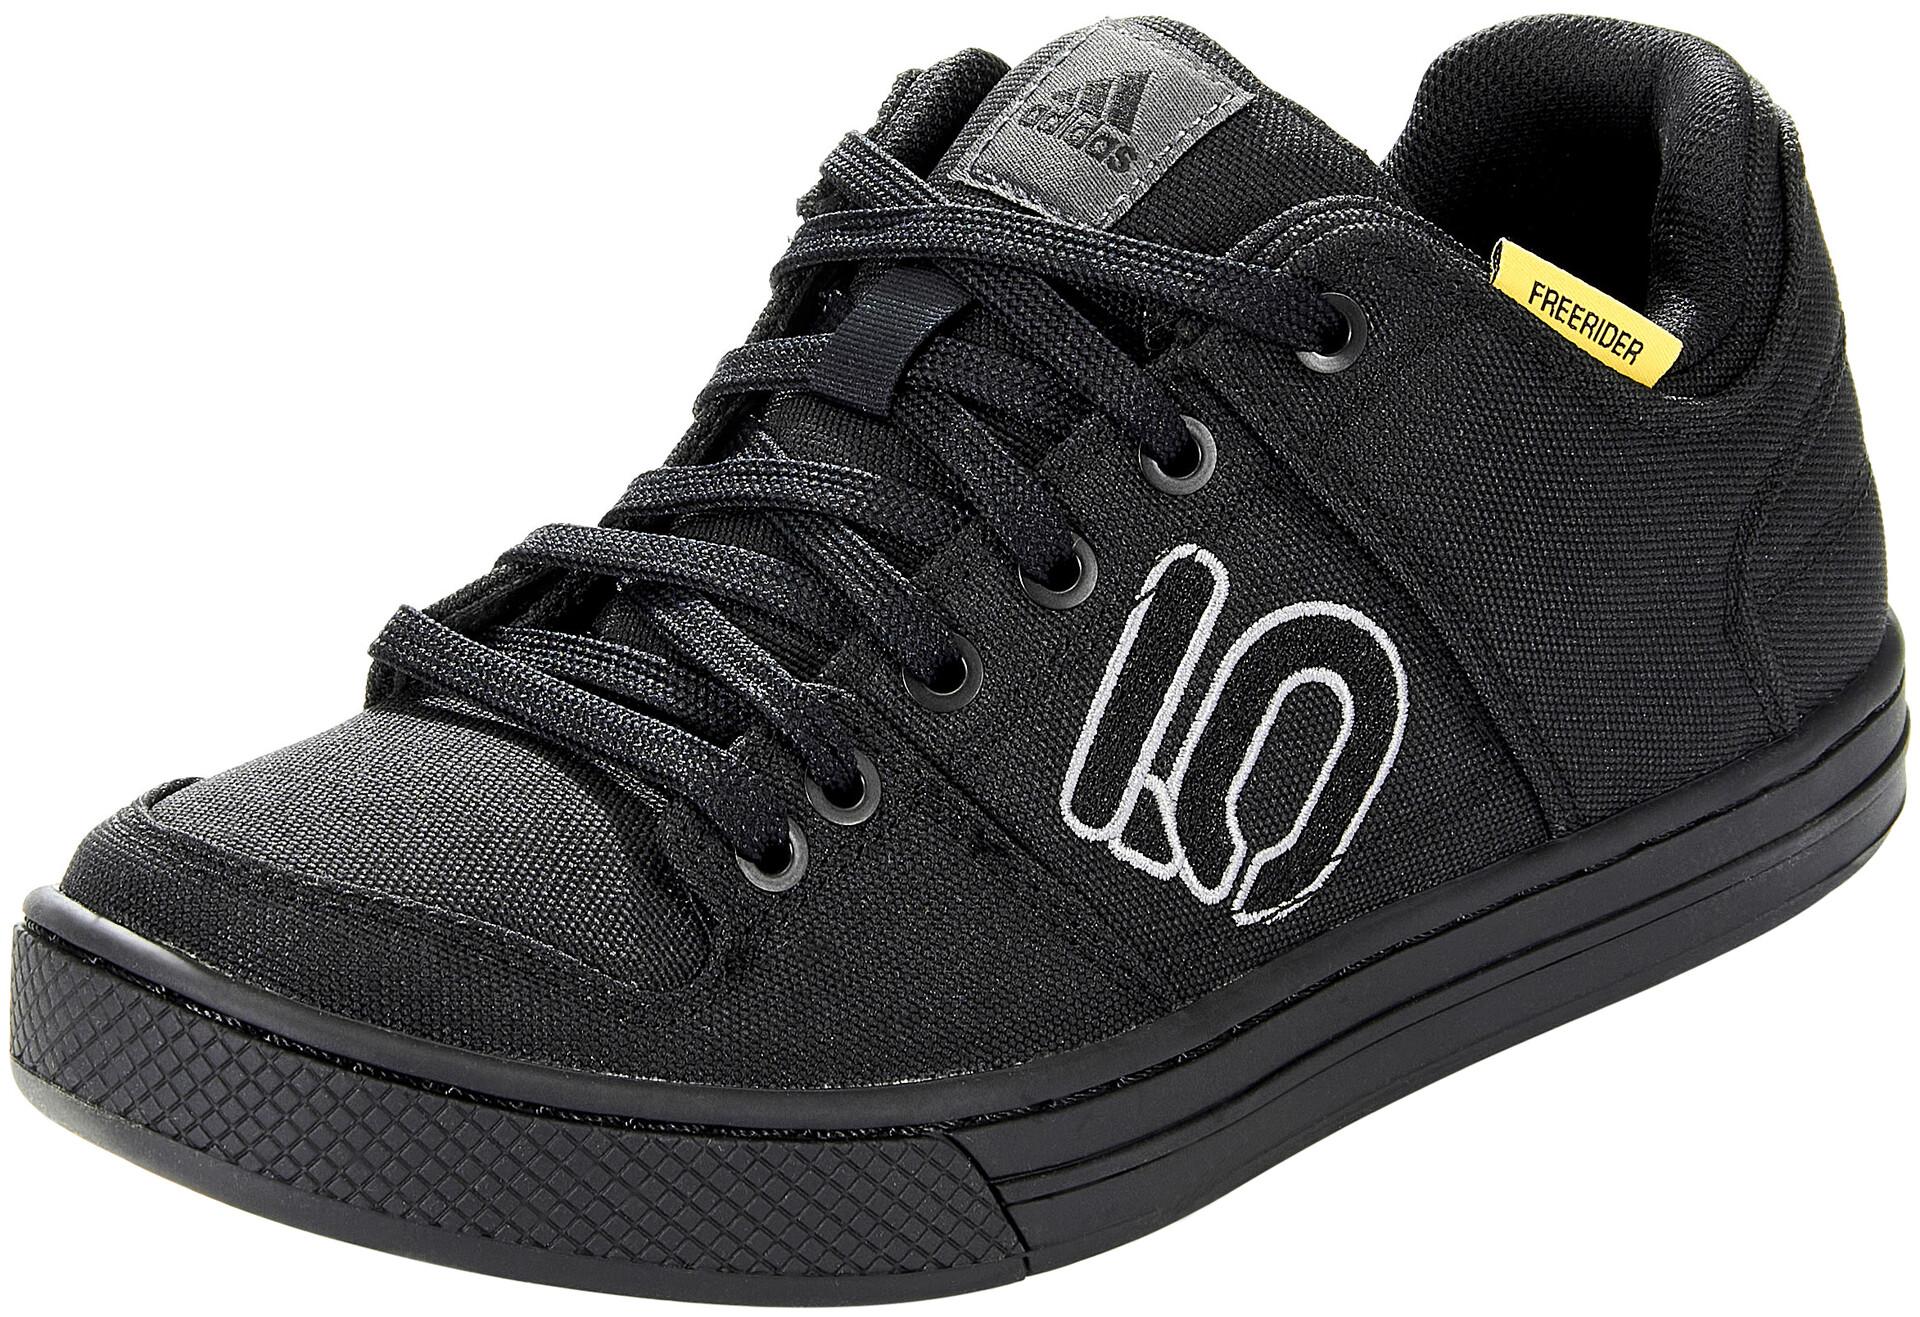 adidas Five Ten Freerider Primeblue Mountain Bike Shoes Men core black/dgh solid grey/grey five